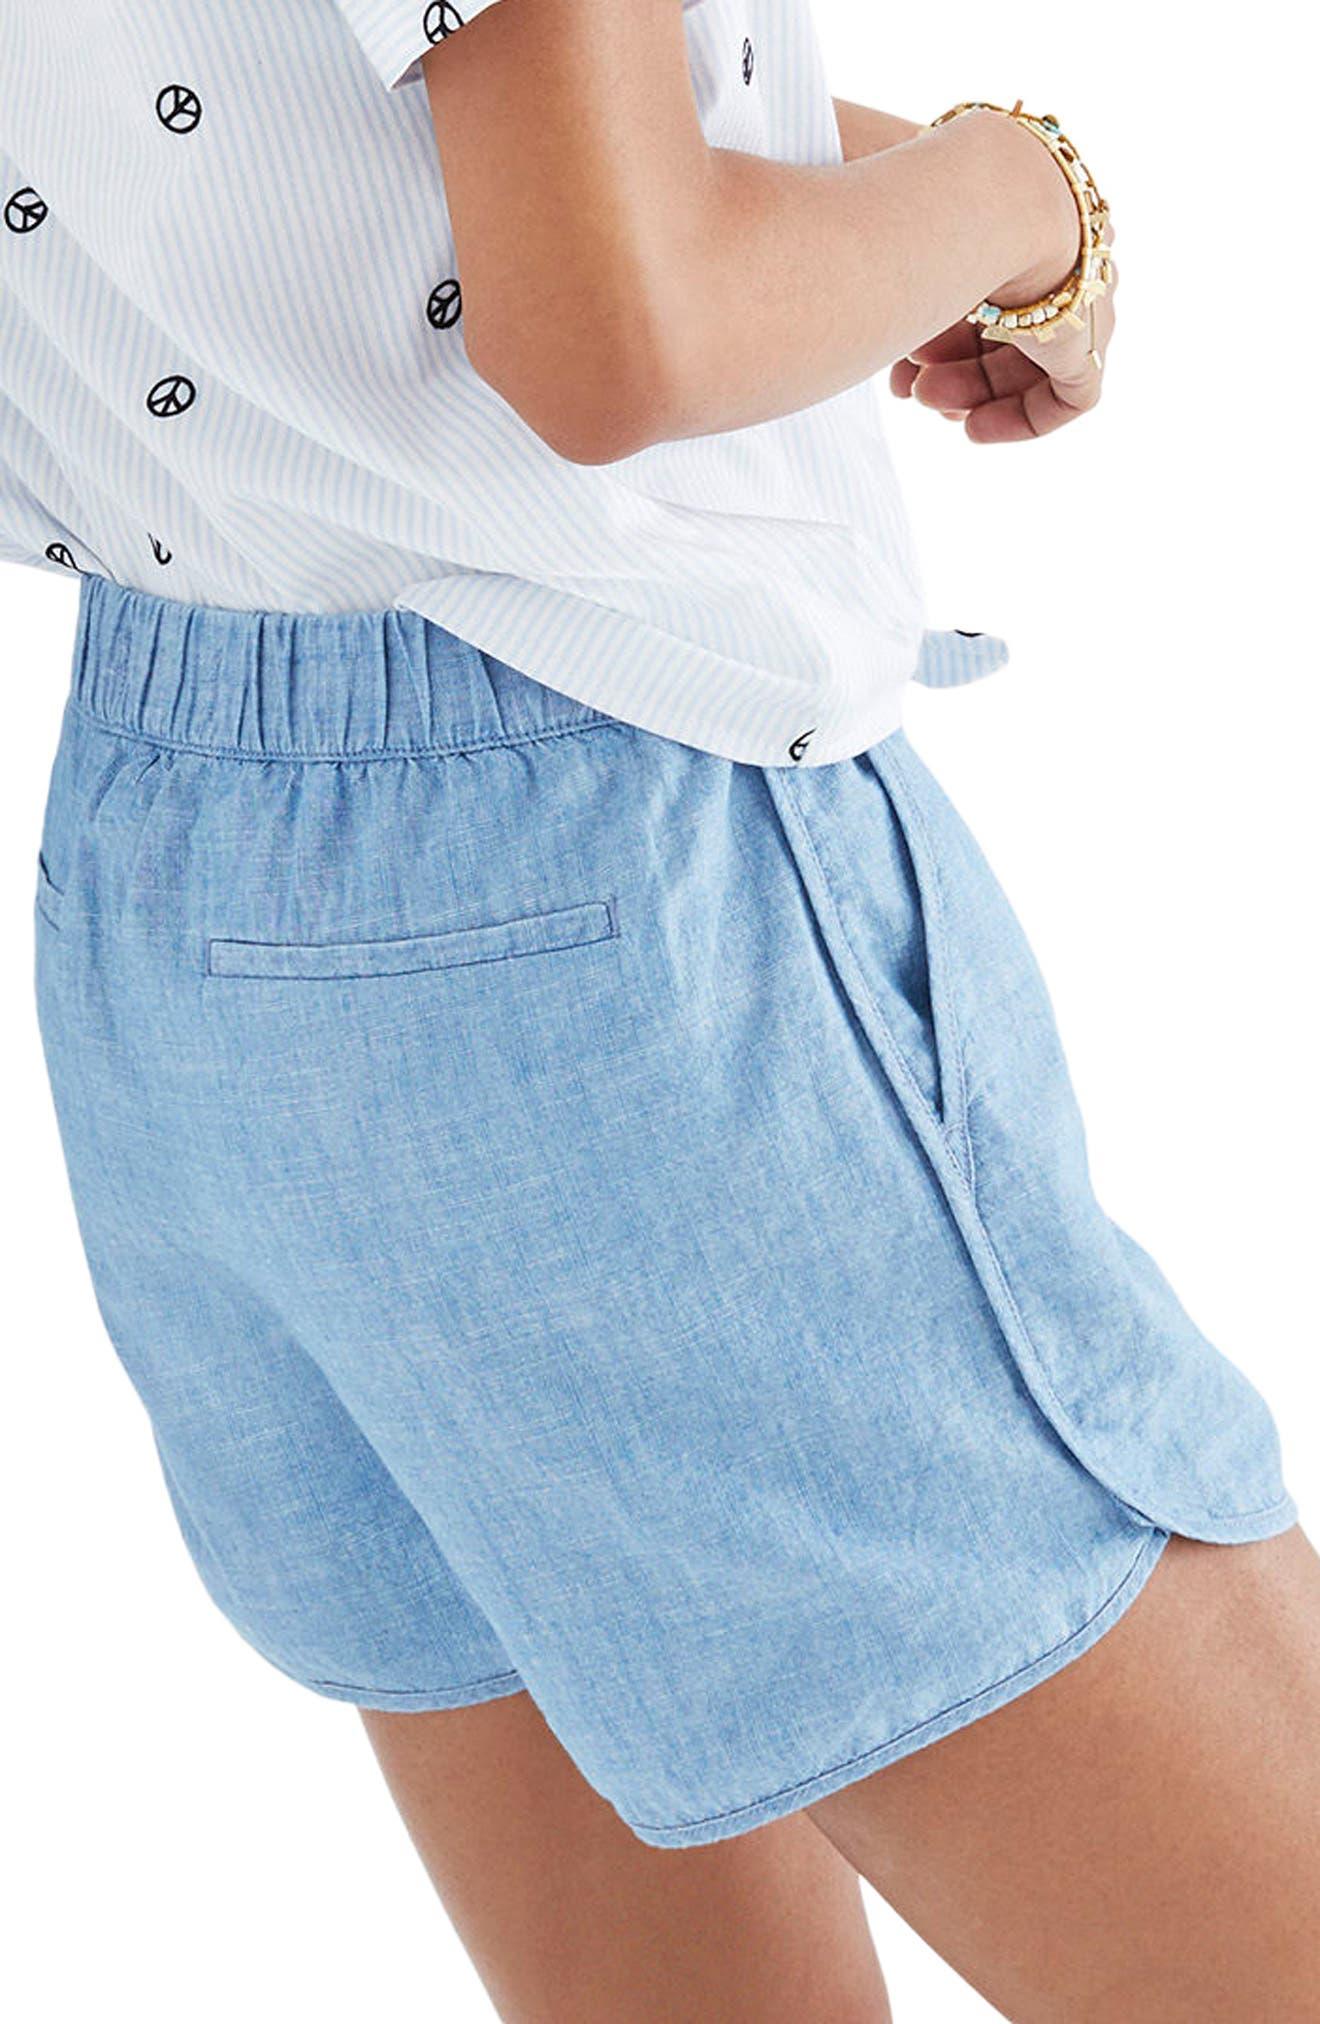 Chambray Pull-On Shorts,                             Alternate thumbnail 3, color,                             400